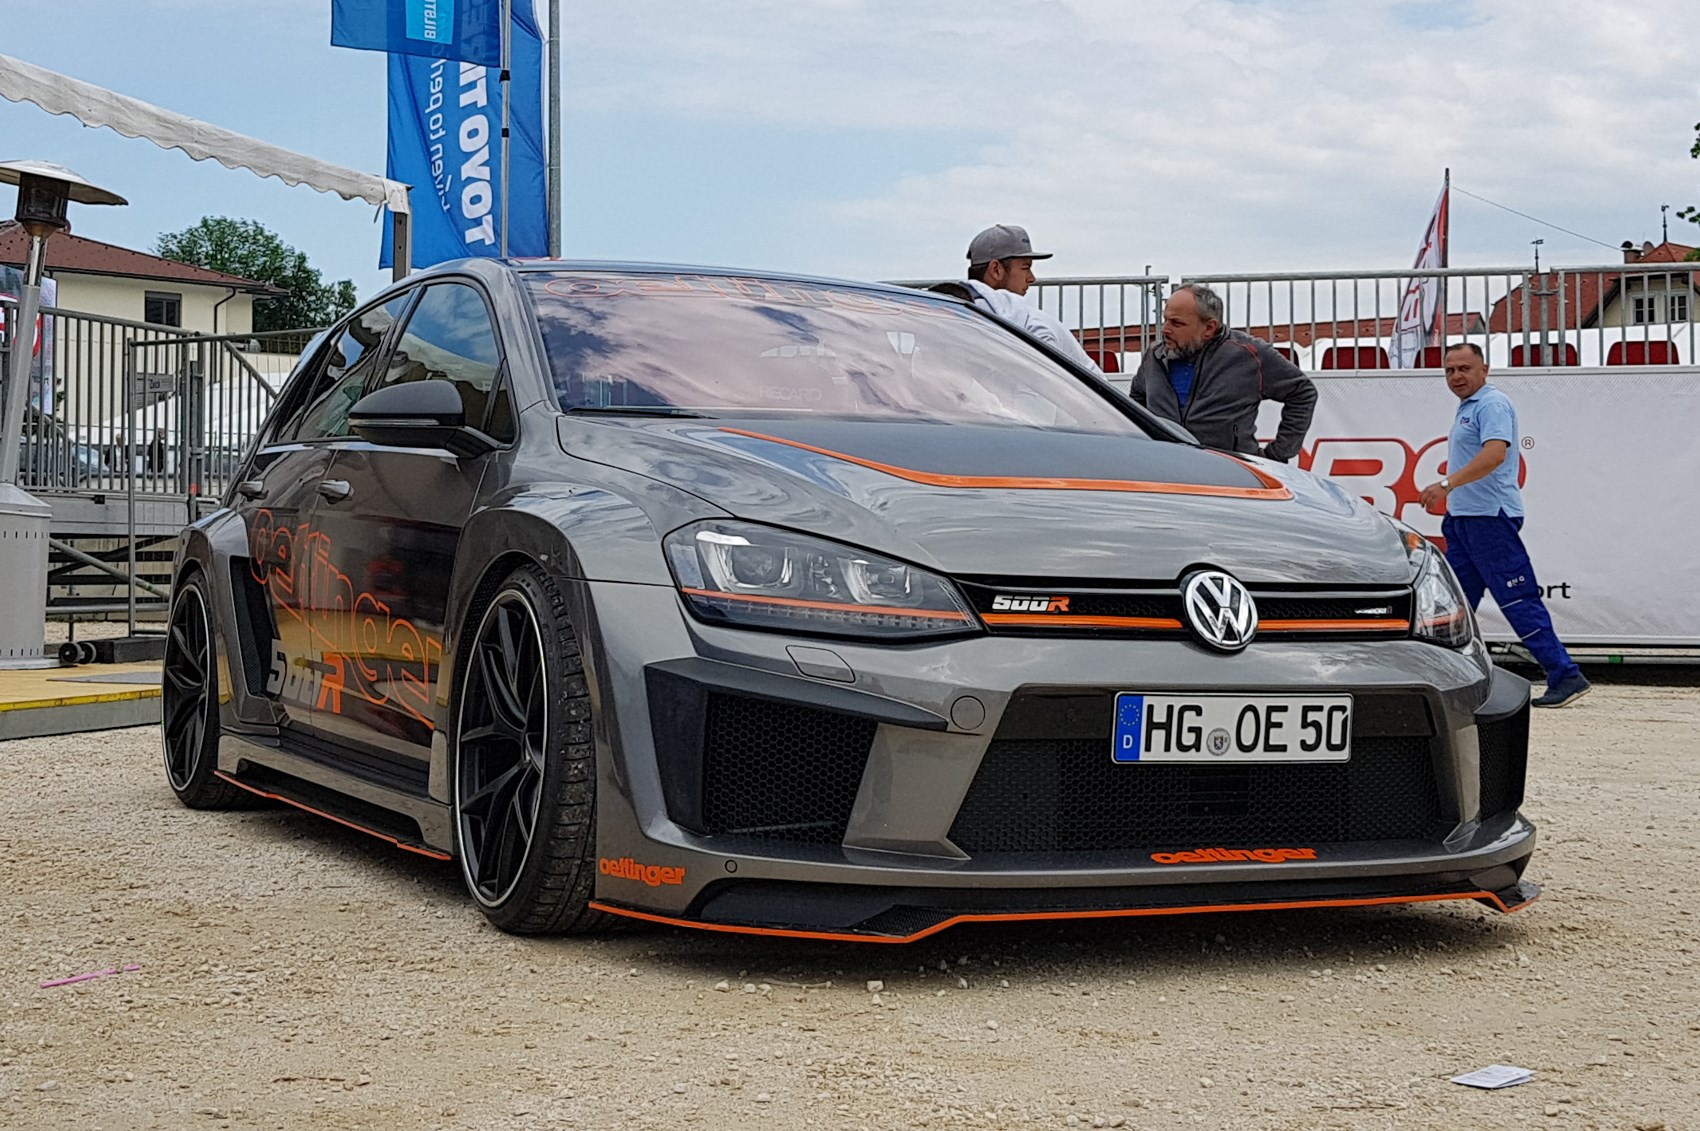 Vw Polo 9n Tuning Forum ✓ Volkswagen Car